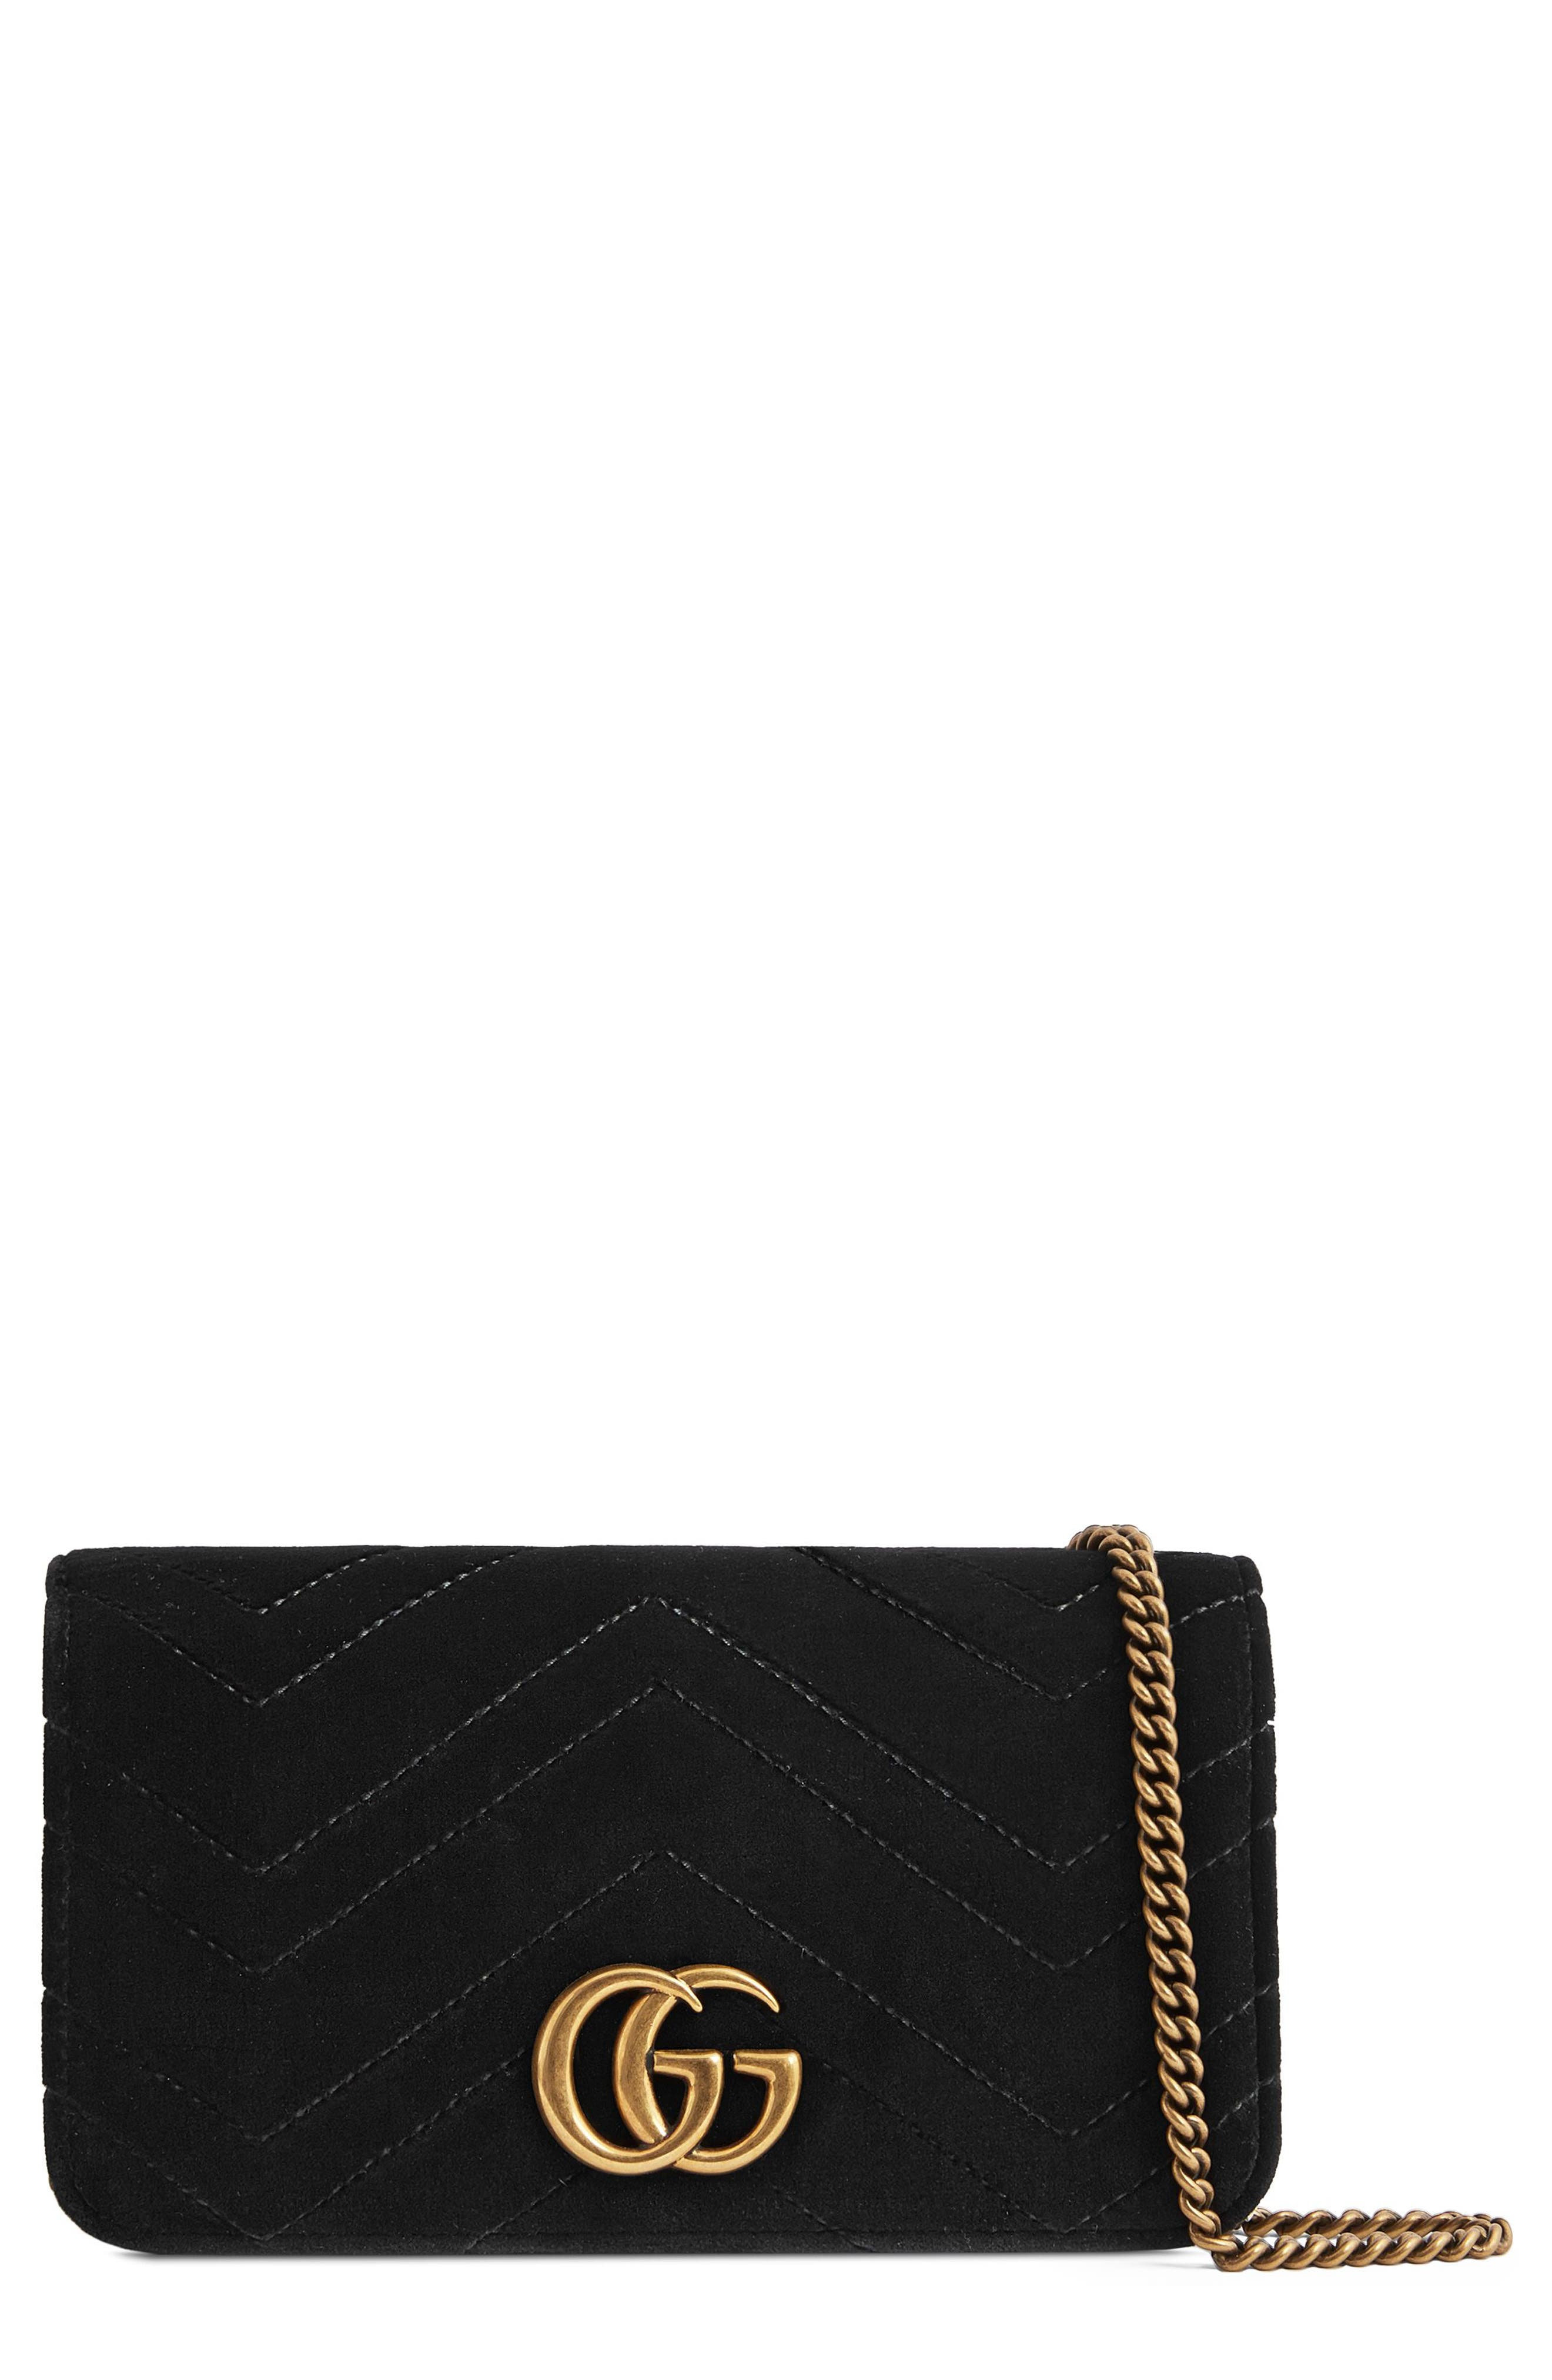 GG Marmont 2.0 Matelassé Velvet Shoulder Bag,                             Main thumbnail 1, color,                             NERO/ NERO